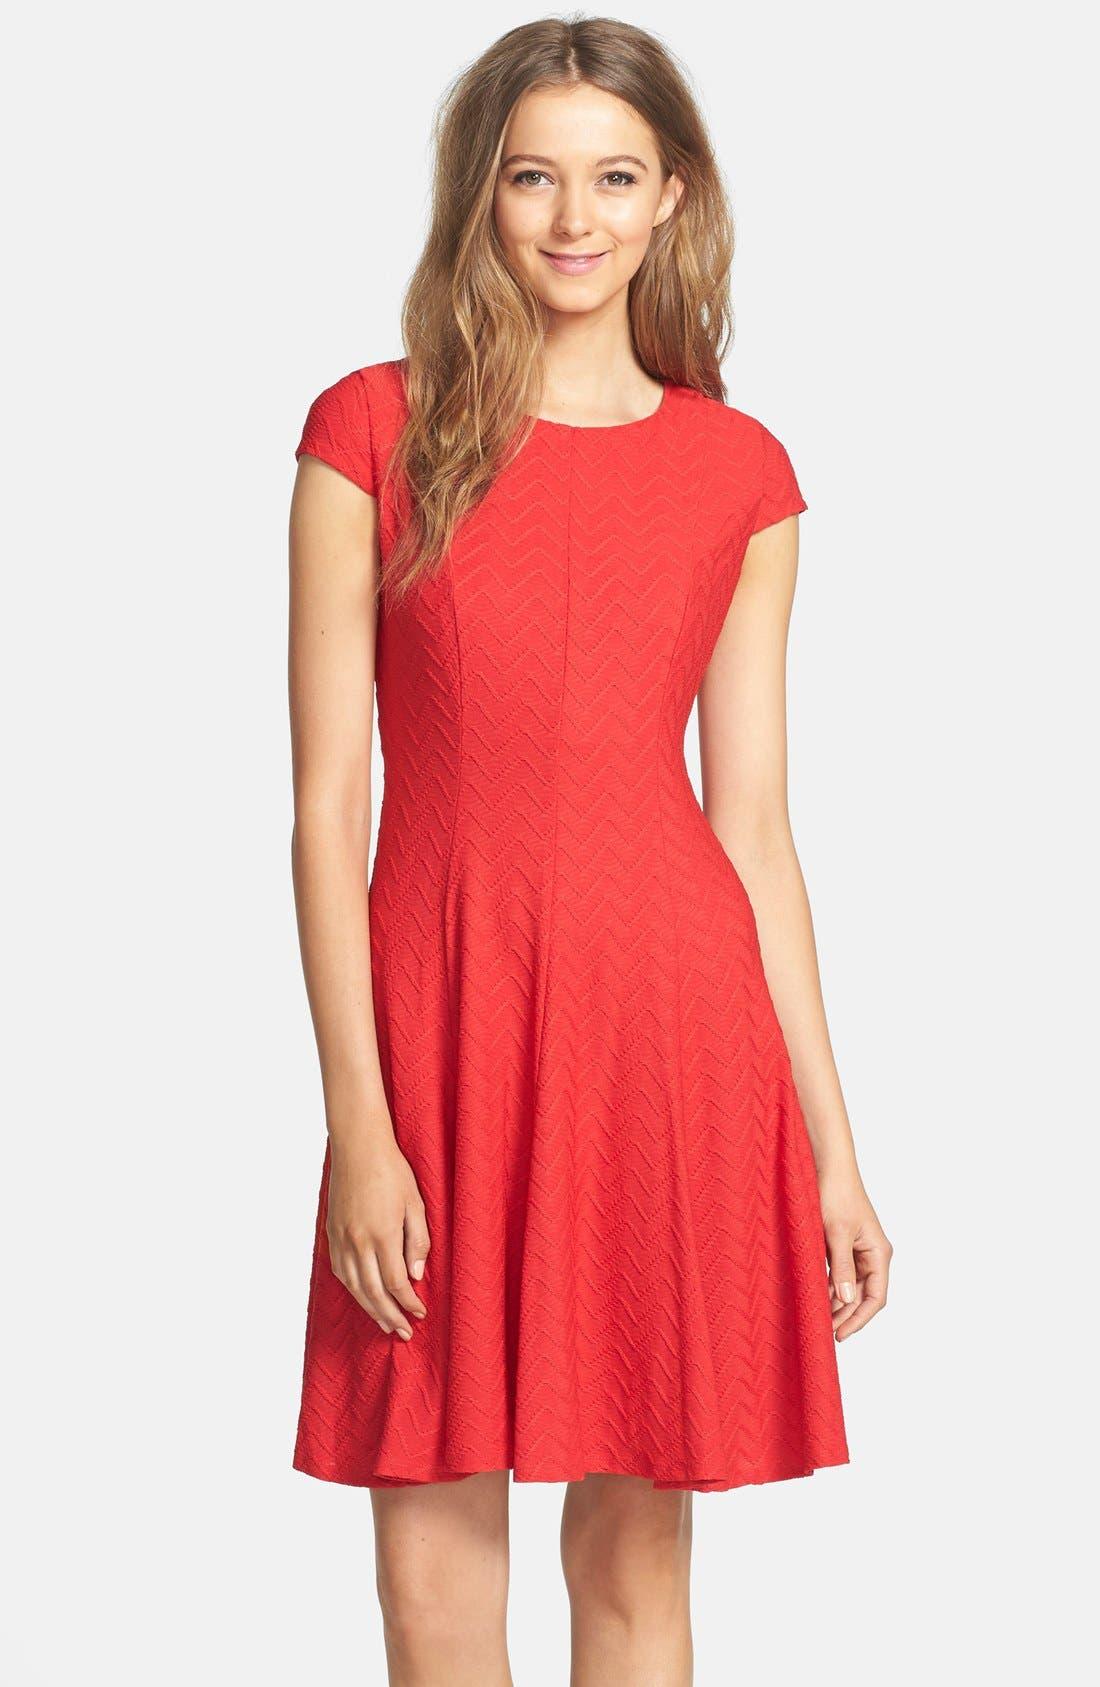 Main Image - Eliza J Textured Knit Fit & Flare Dress (Petite)